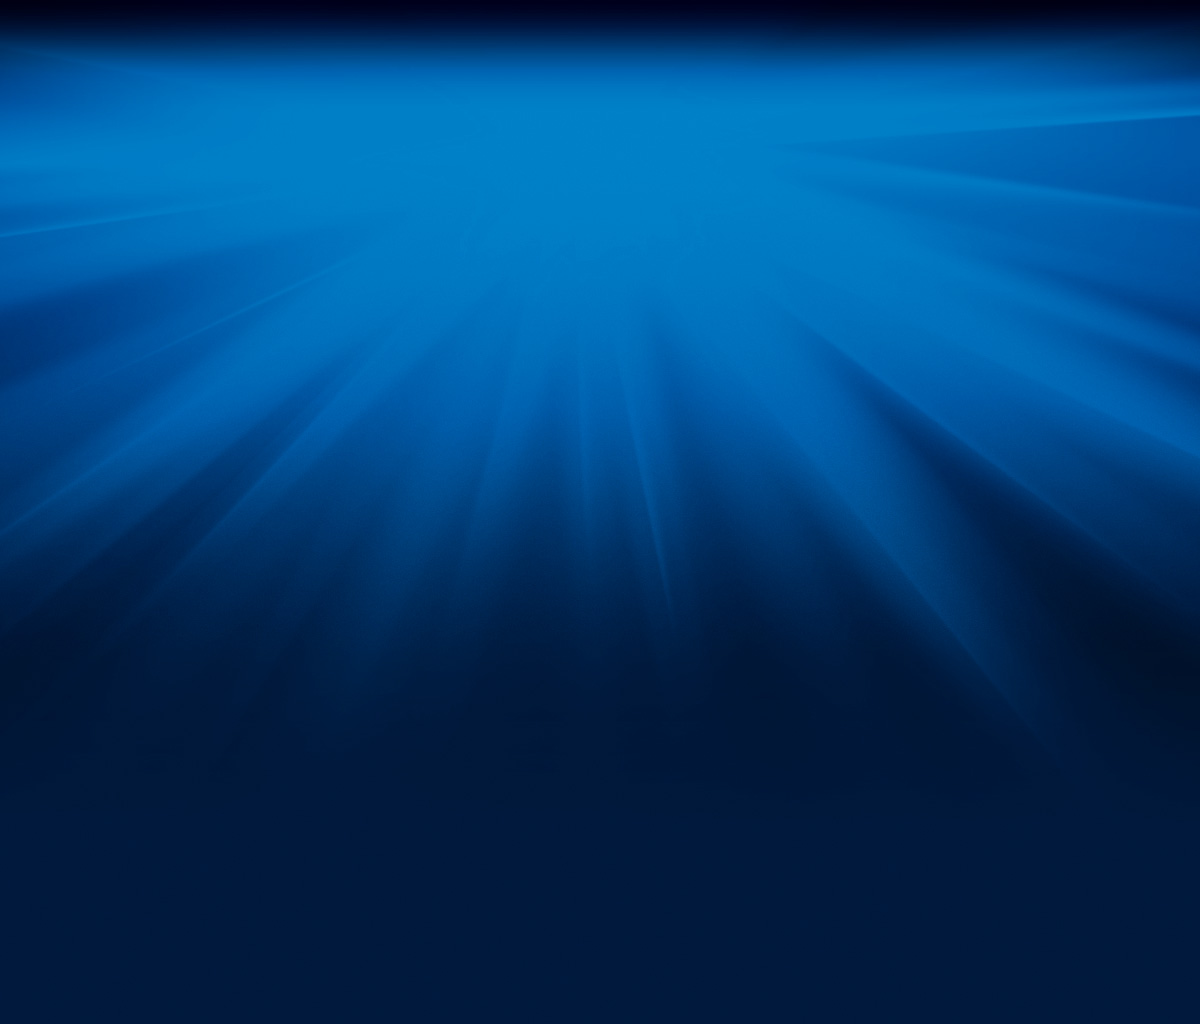 [72+] Navy Blue Background On WallpaperSafari